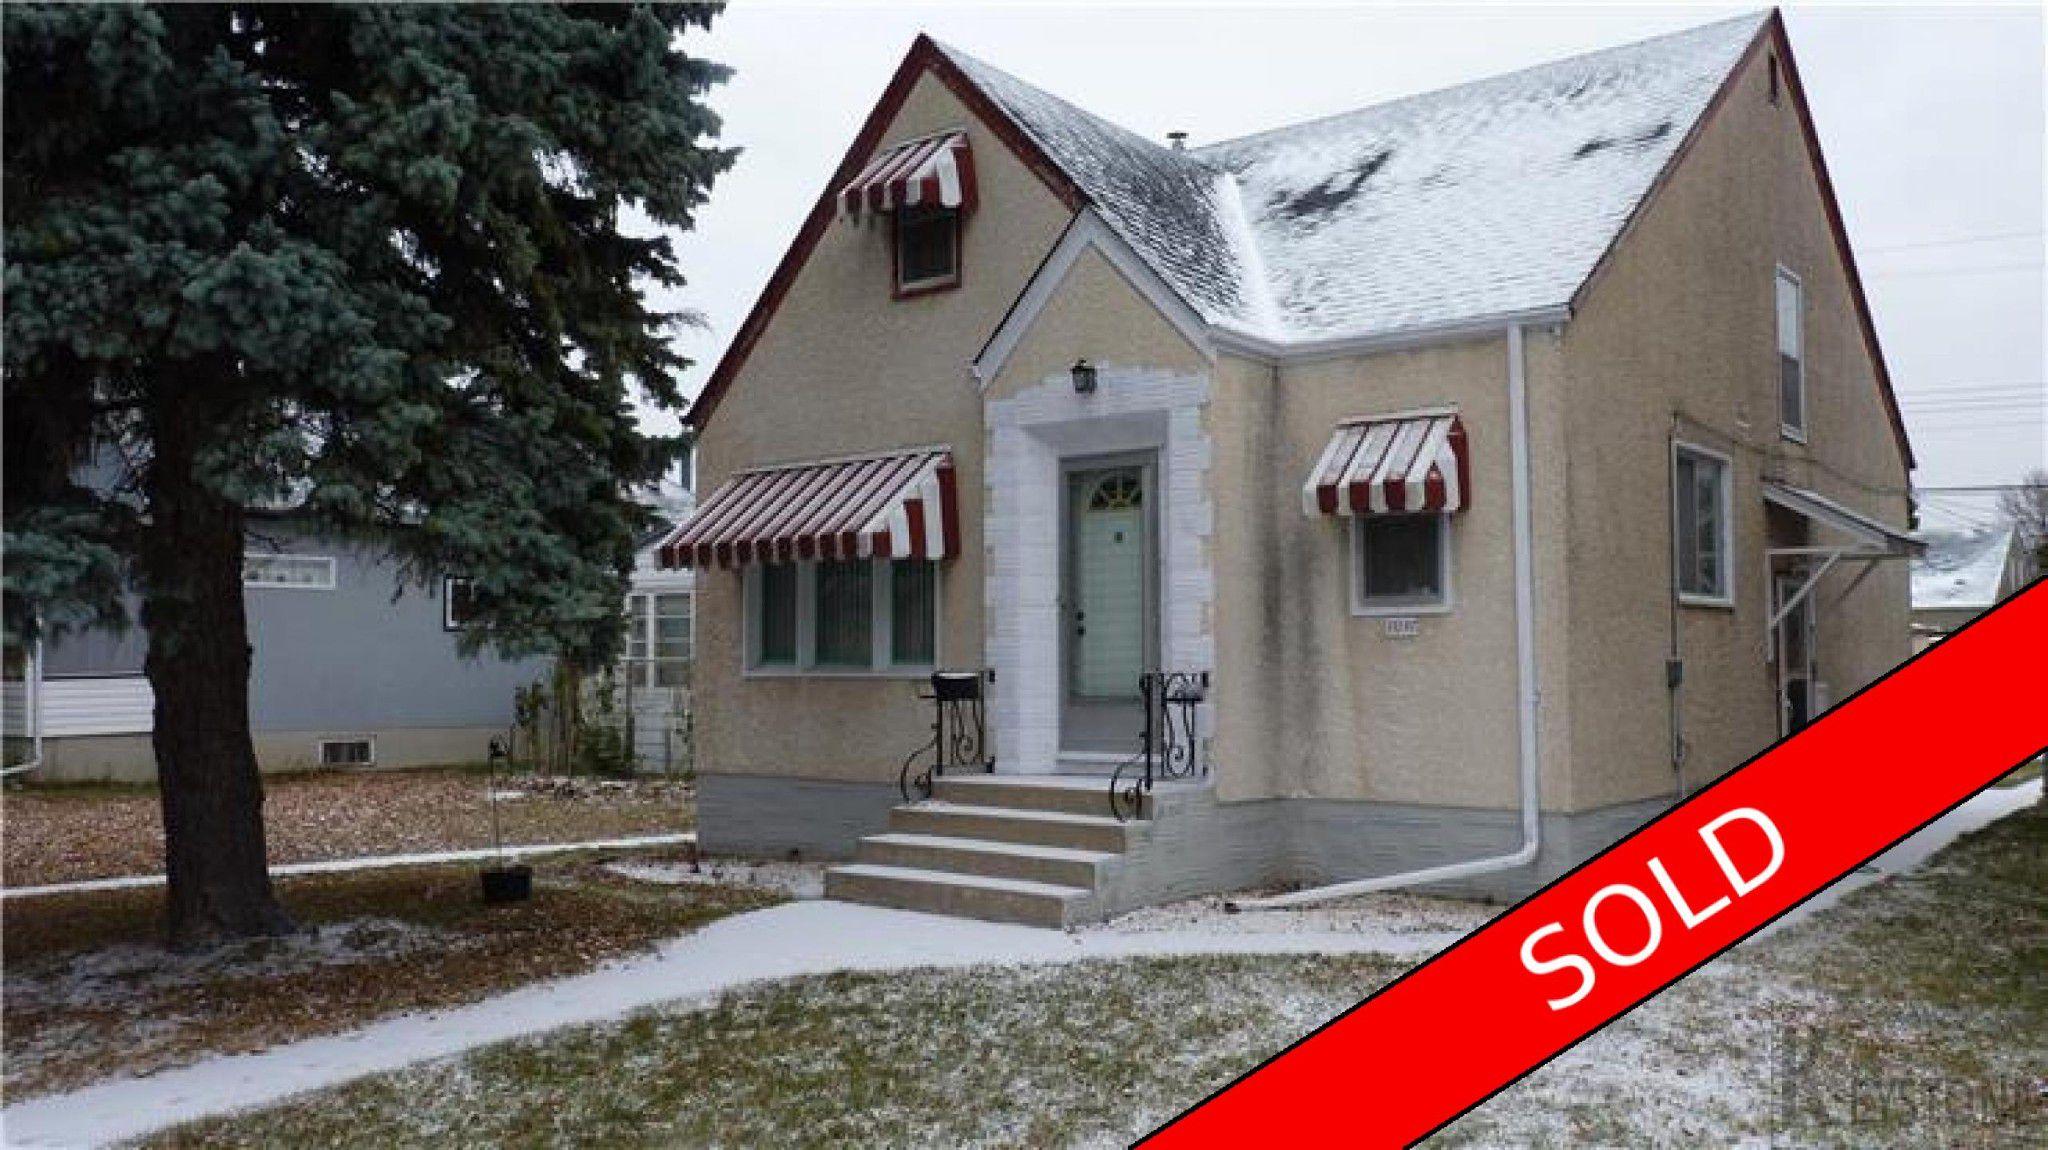 Main Photo: 695 Machray AVE in Winnipeg, MB R2W1B4: House for sale : MLS®# 1726718